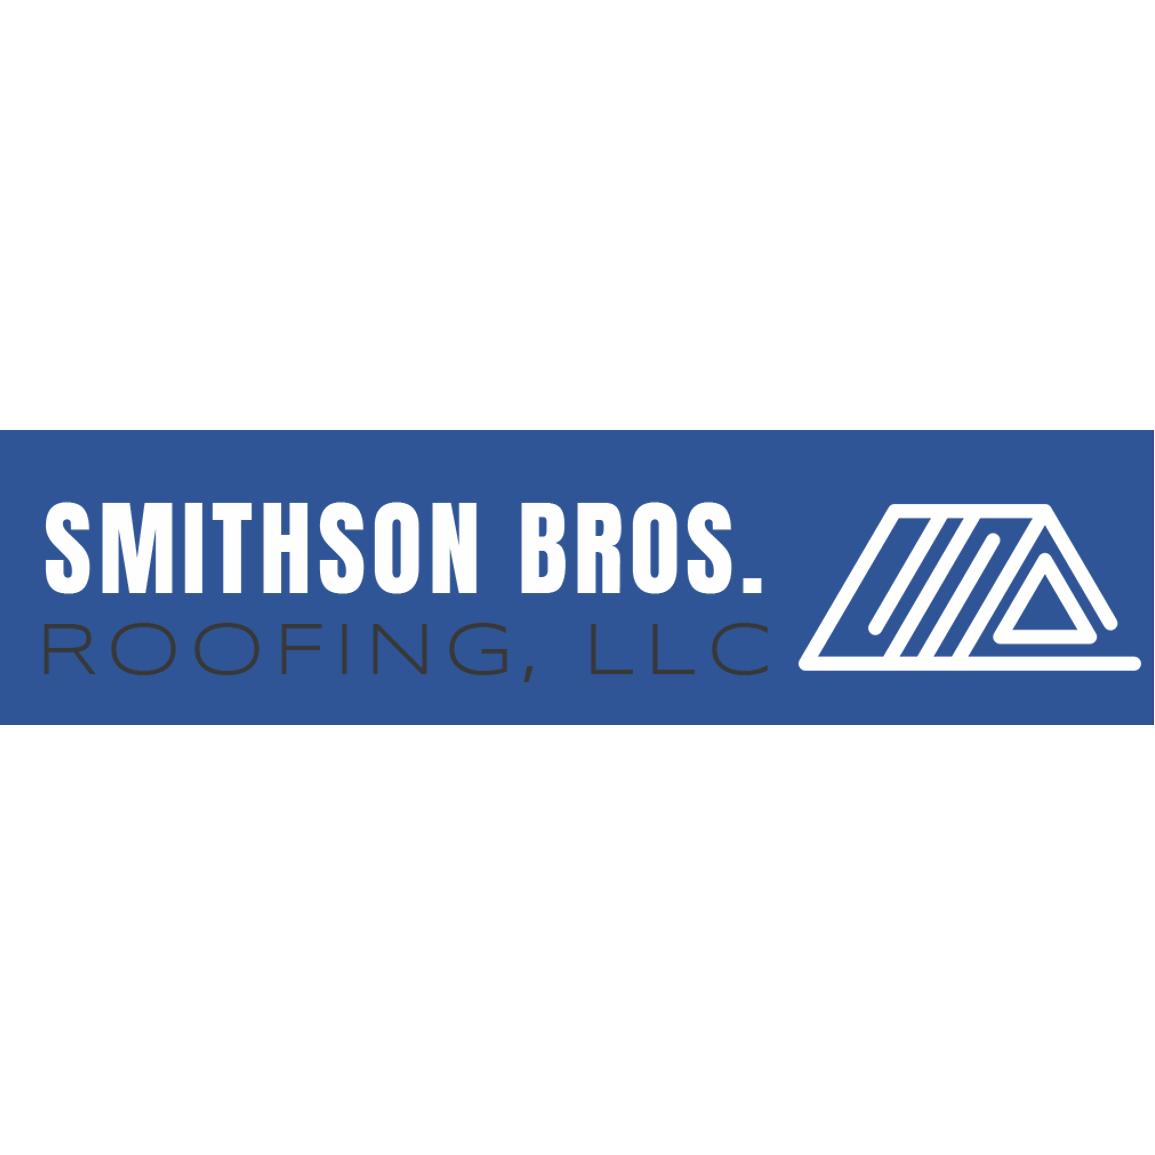 Smithson Bros. Roofing, LLC